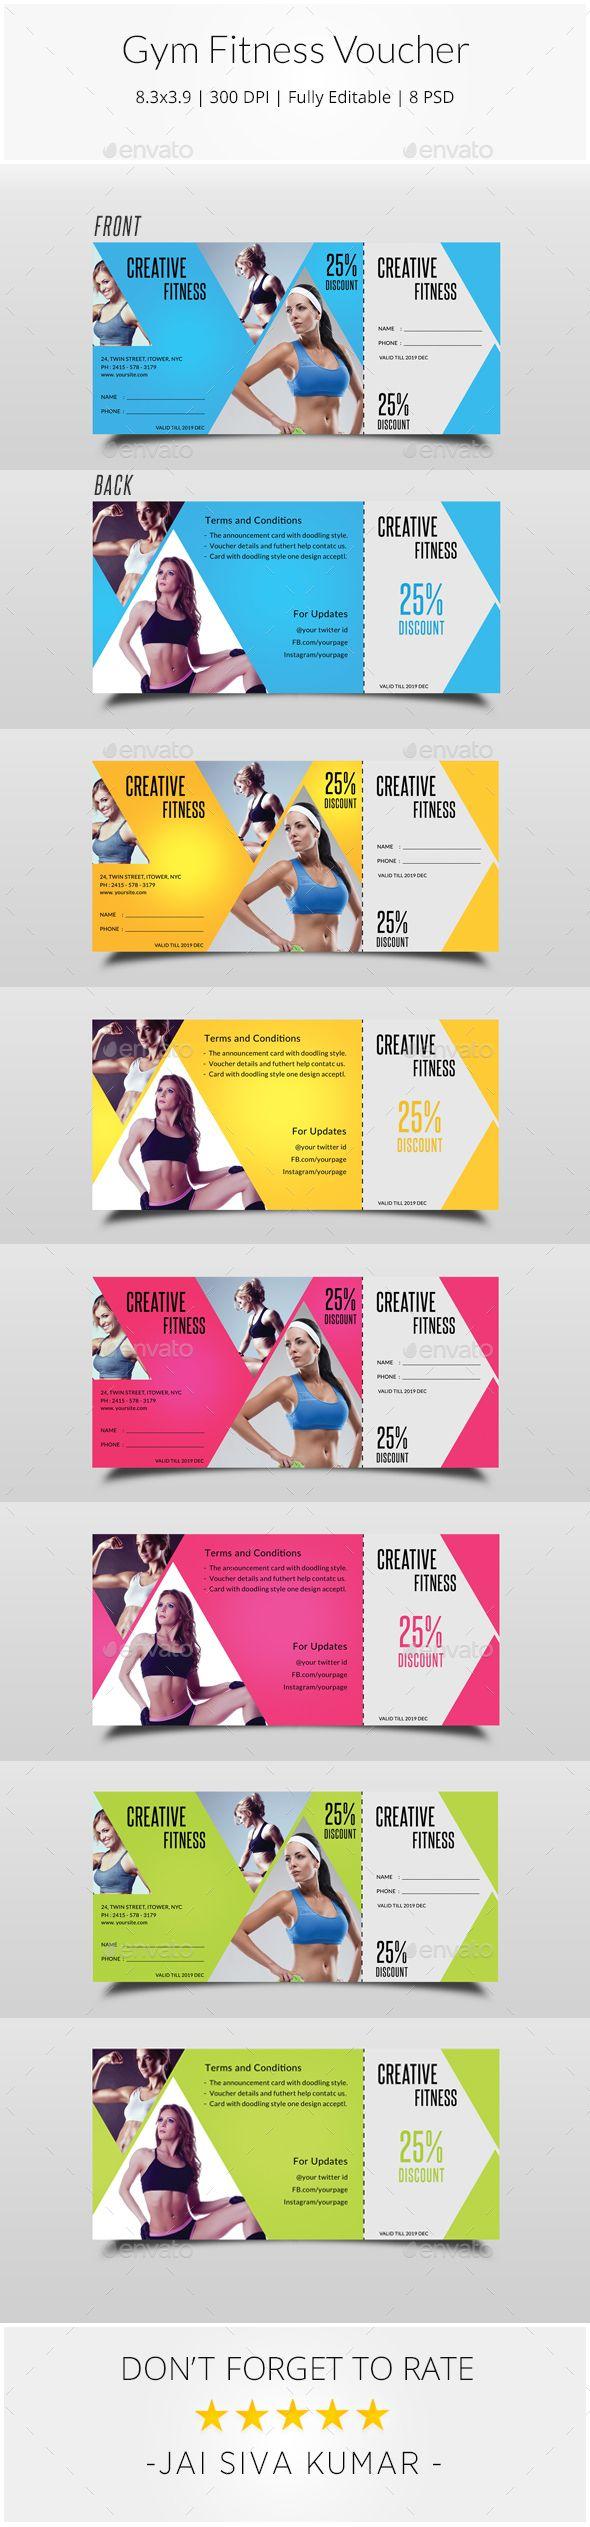 Gym Fitness Voucher Template PSD. Download here: http://graphicriver.net/item/gym-fitness-voucher/15189456?ref=ksioks